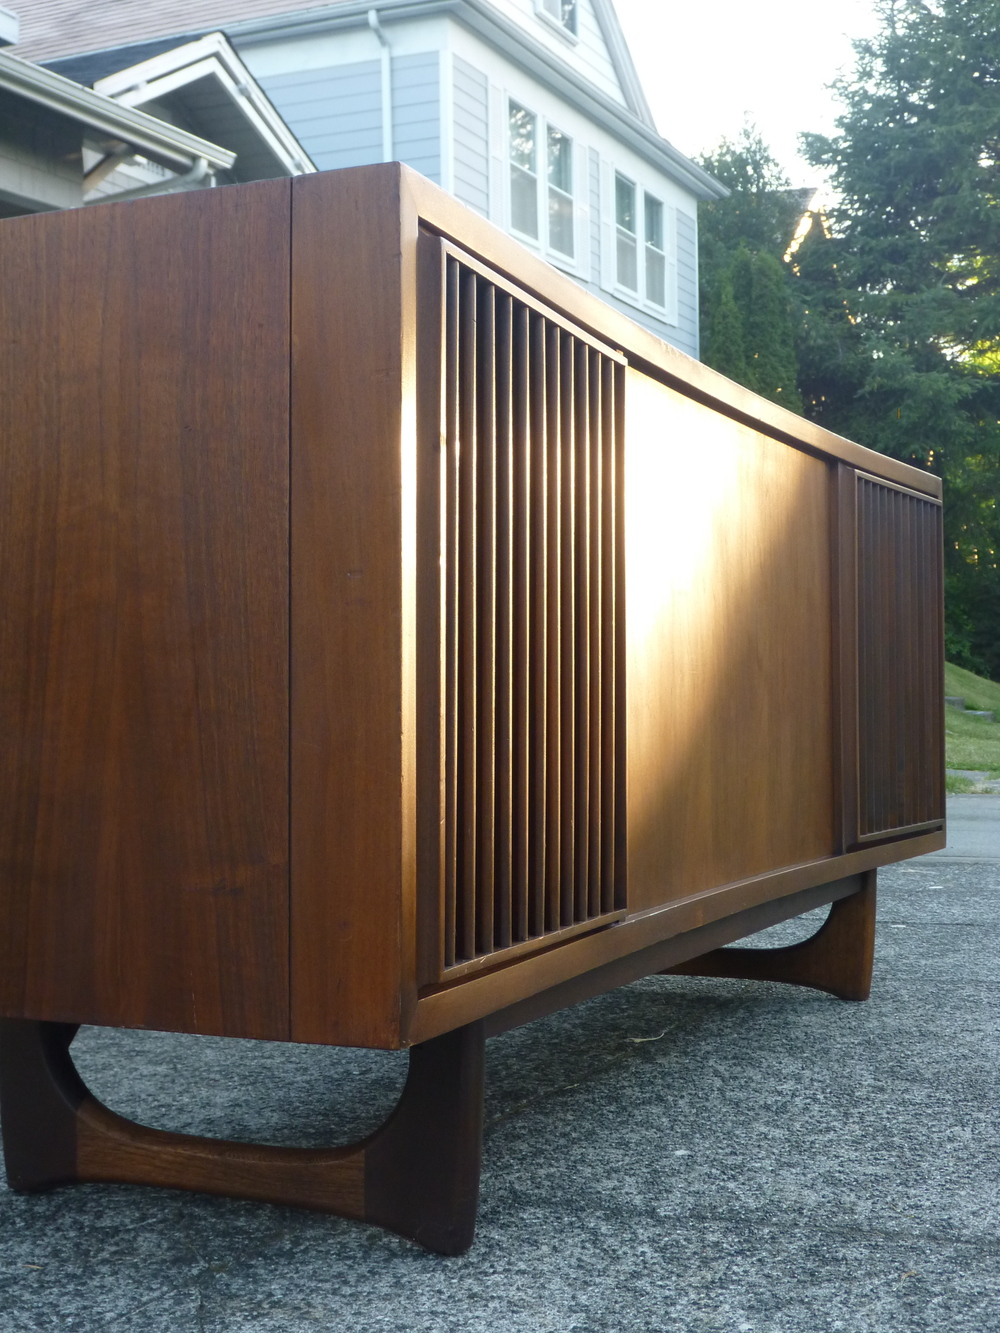 RCA stereo console